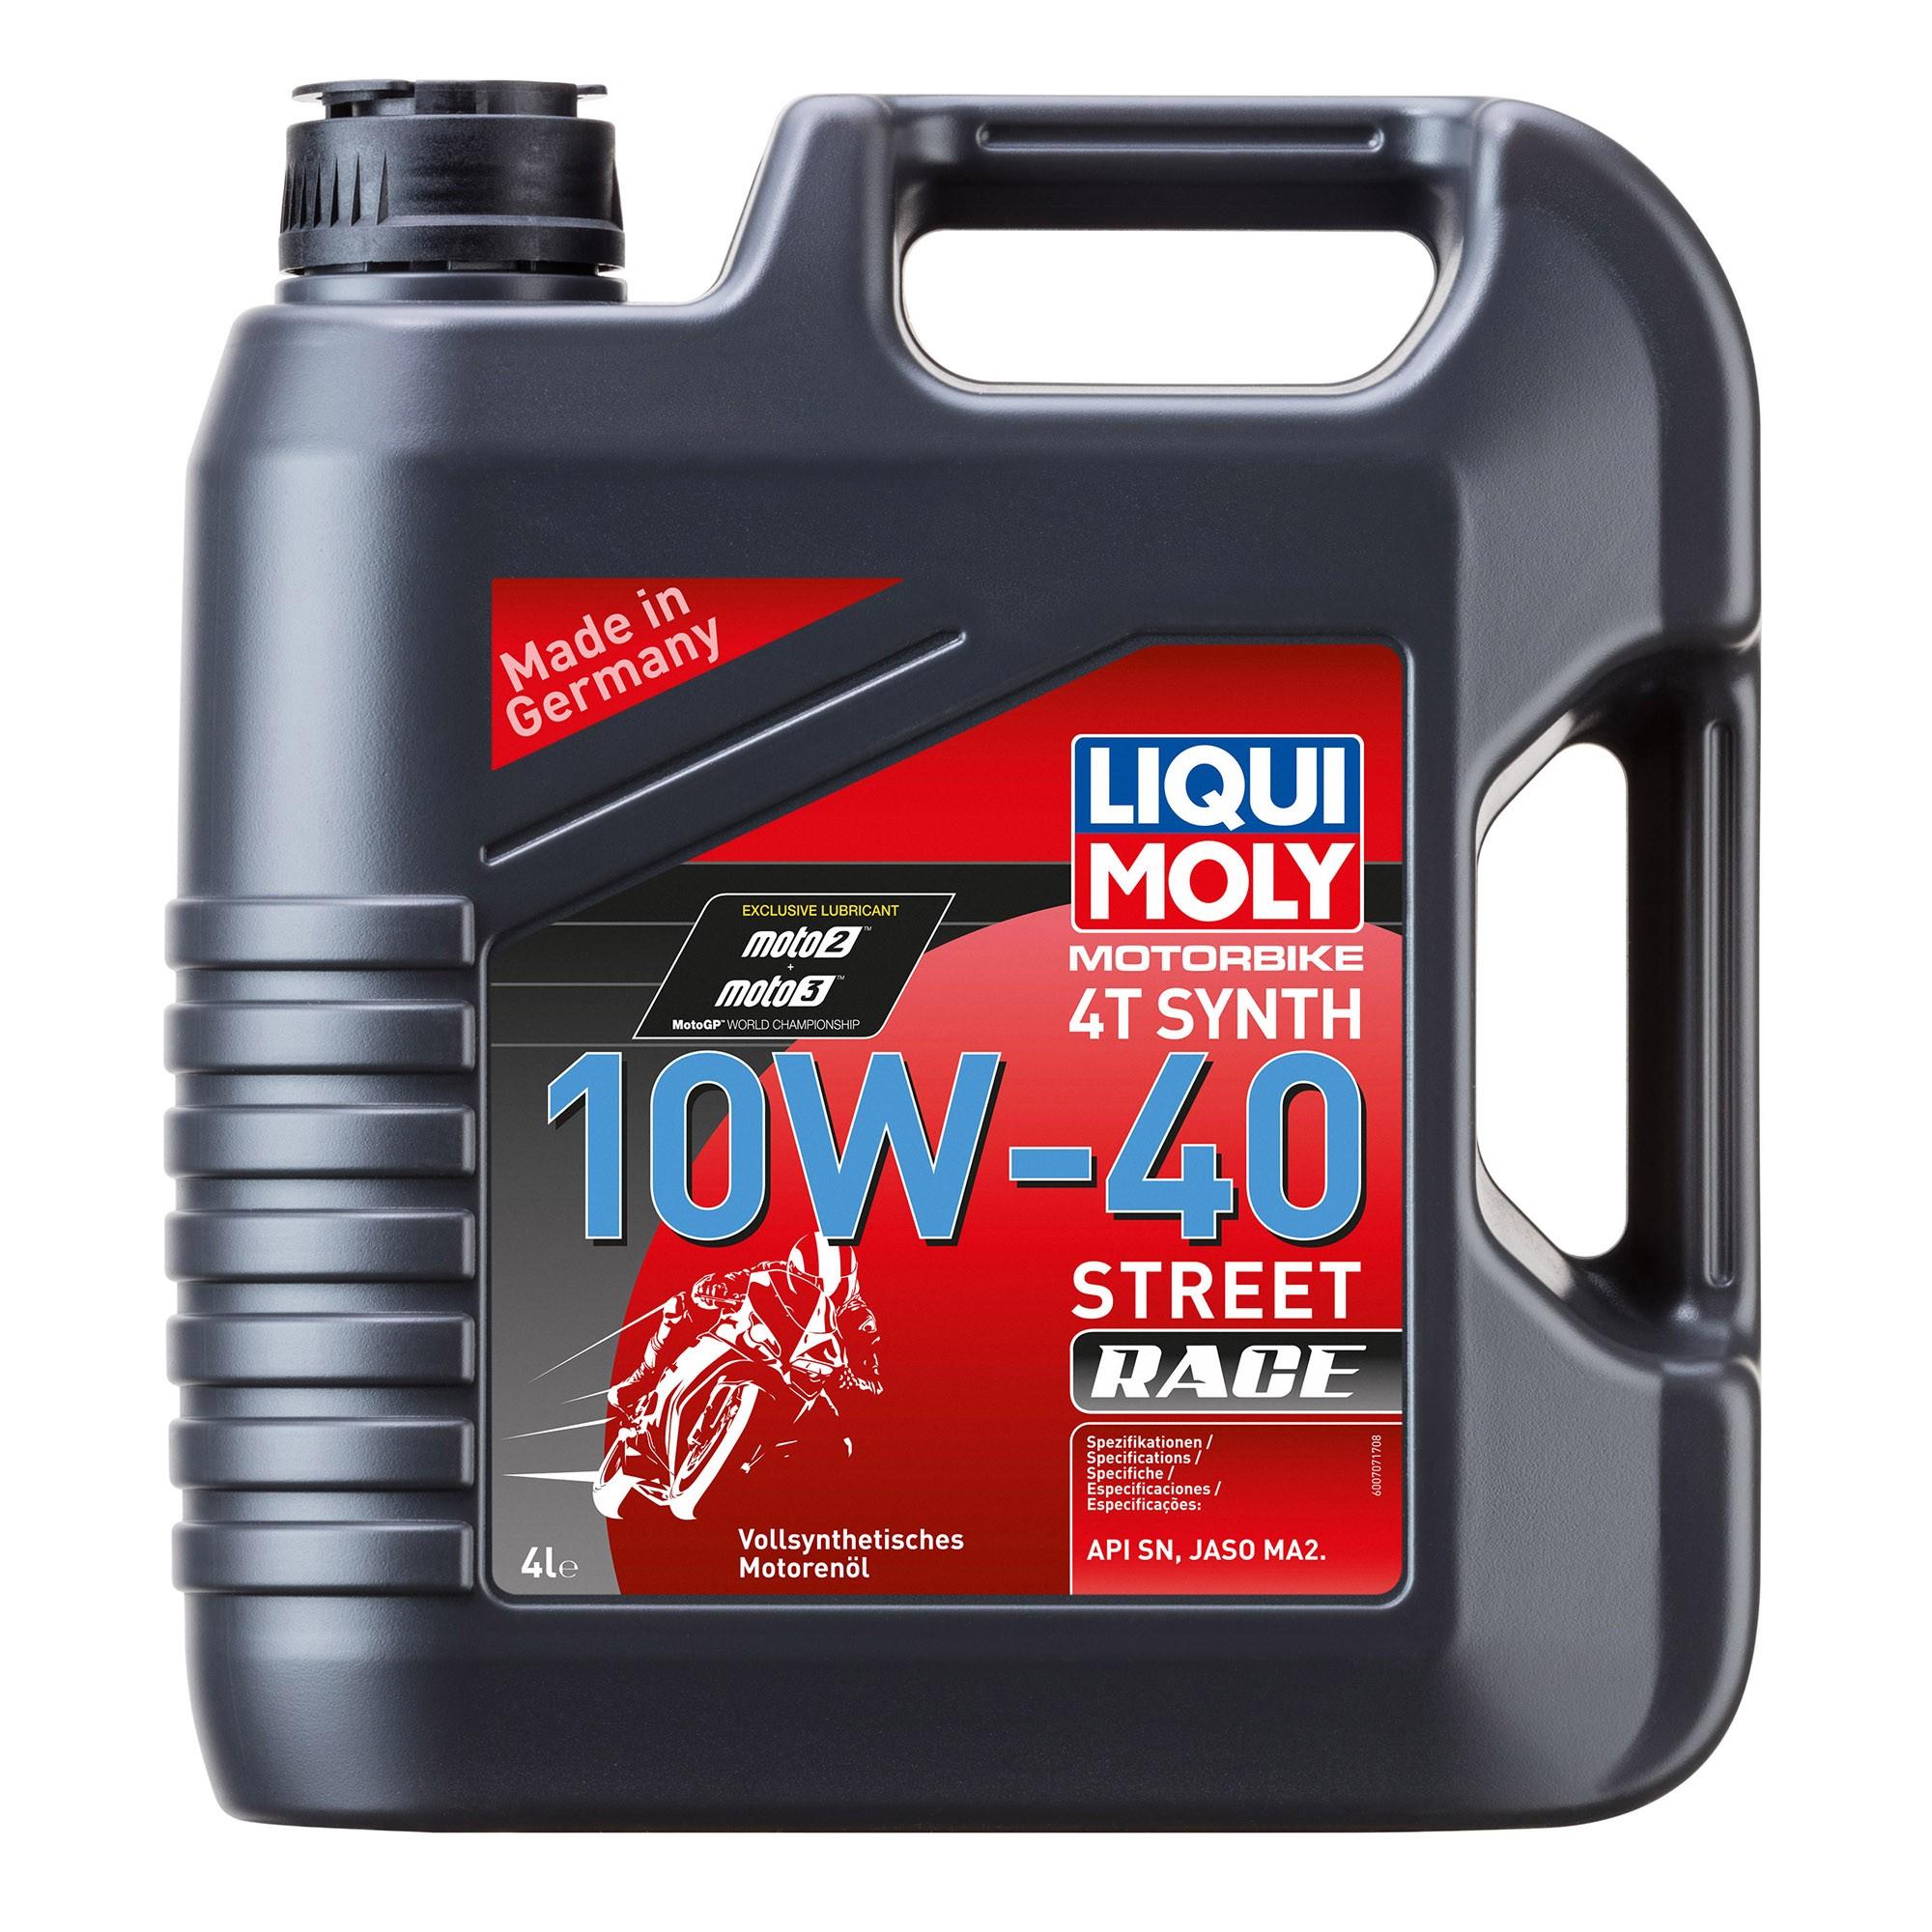 Liqui Moly - Oil 4-Stroke - Fully Synth - Street Race - 10w-40 - 4L